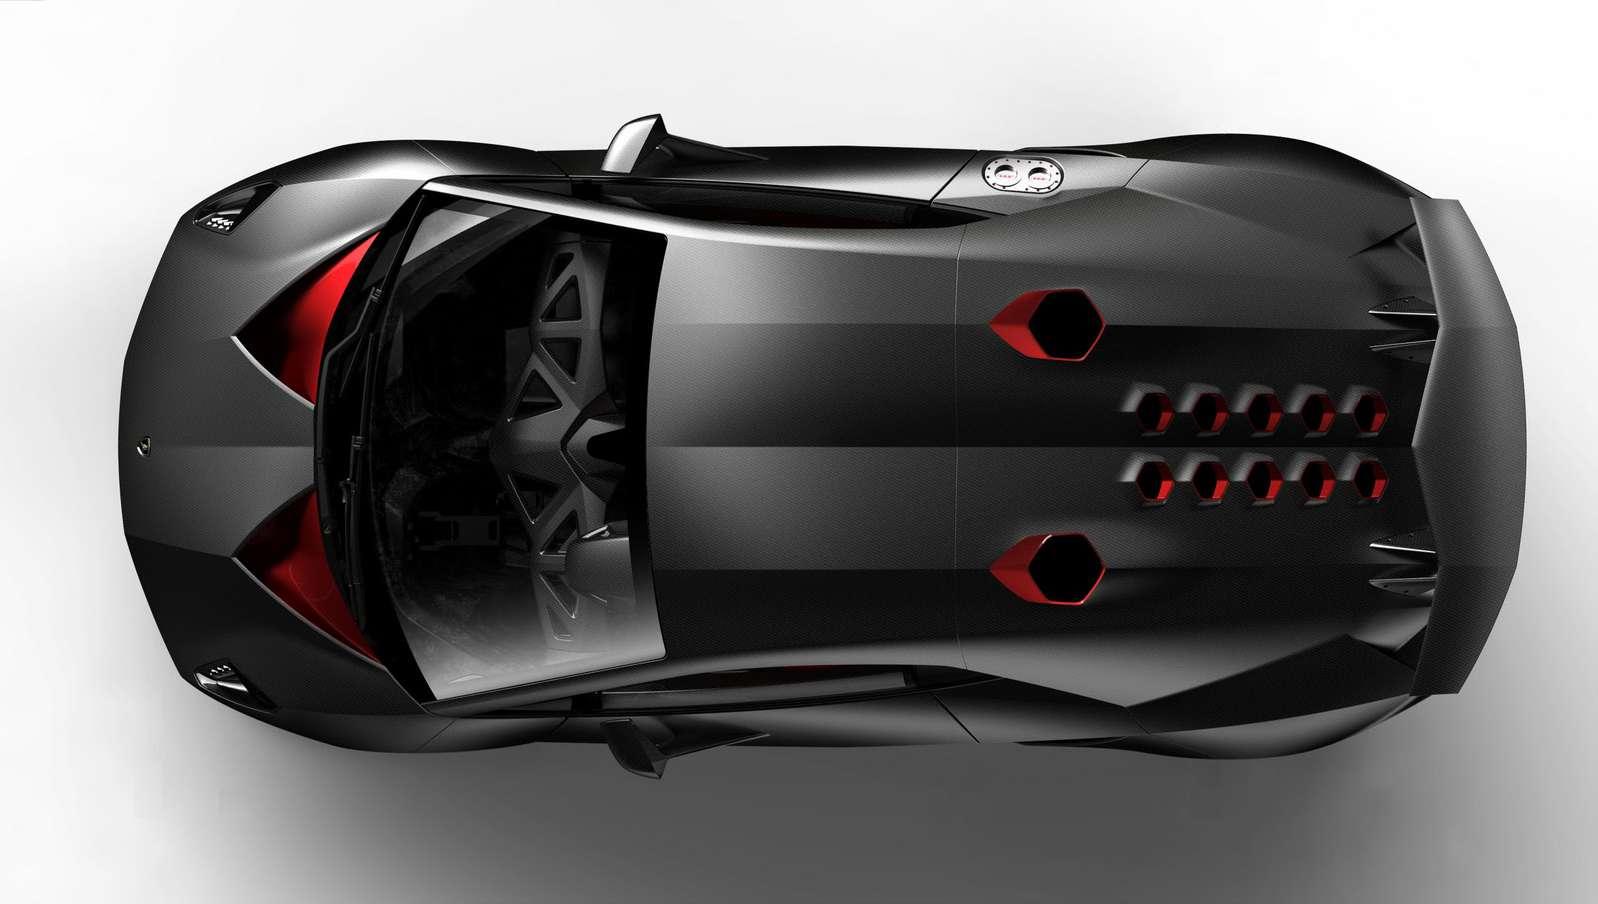 Lamborghini Sesto Elemento Concept paryz 2010 wrzesien 2010